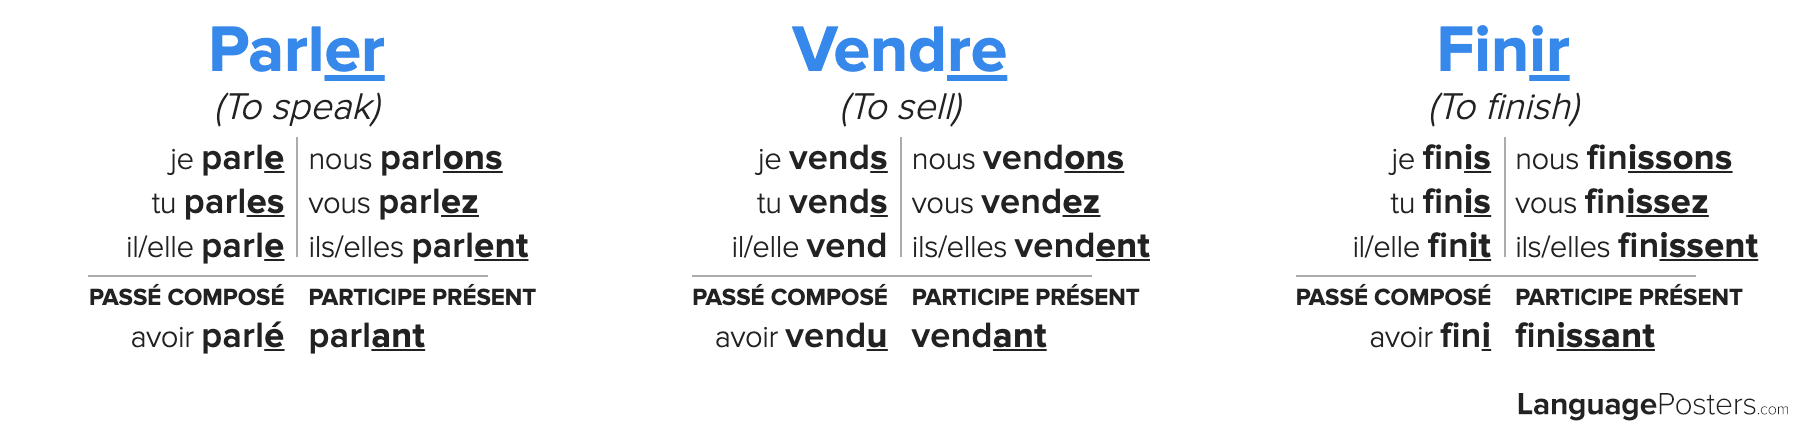 French Regular Verb Conjugation Chart